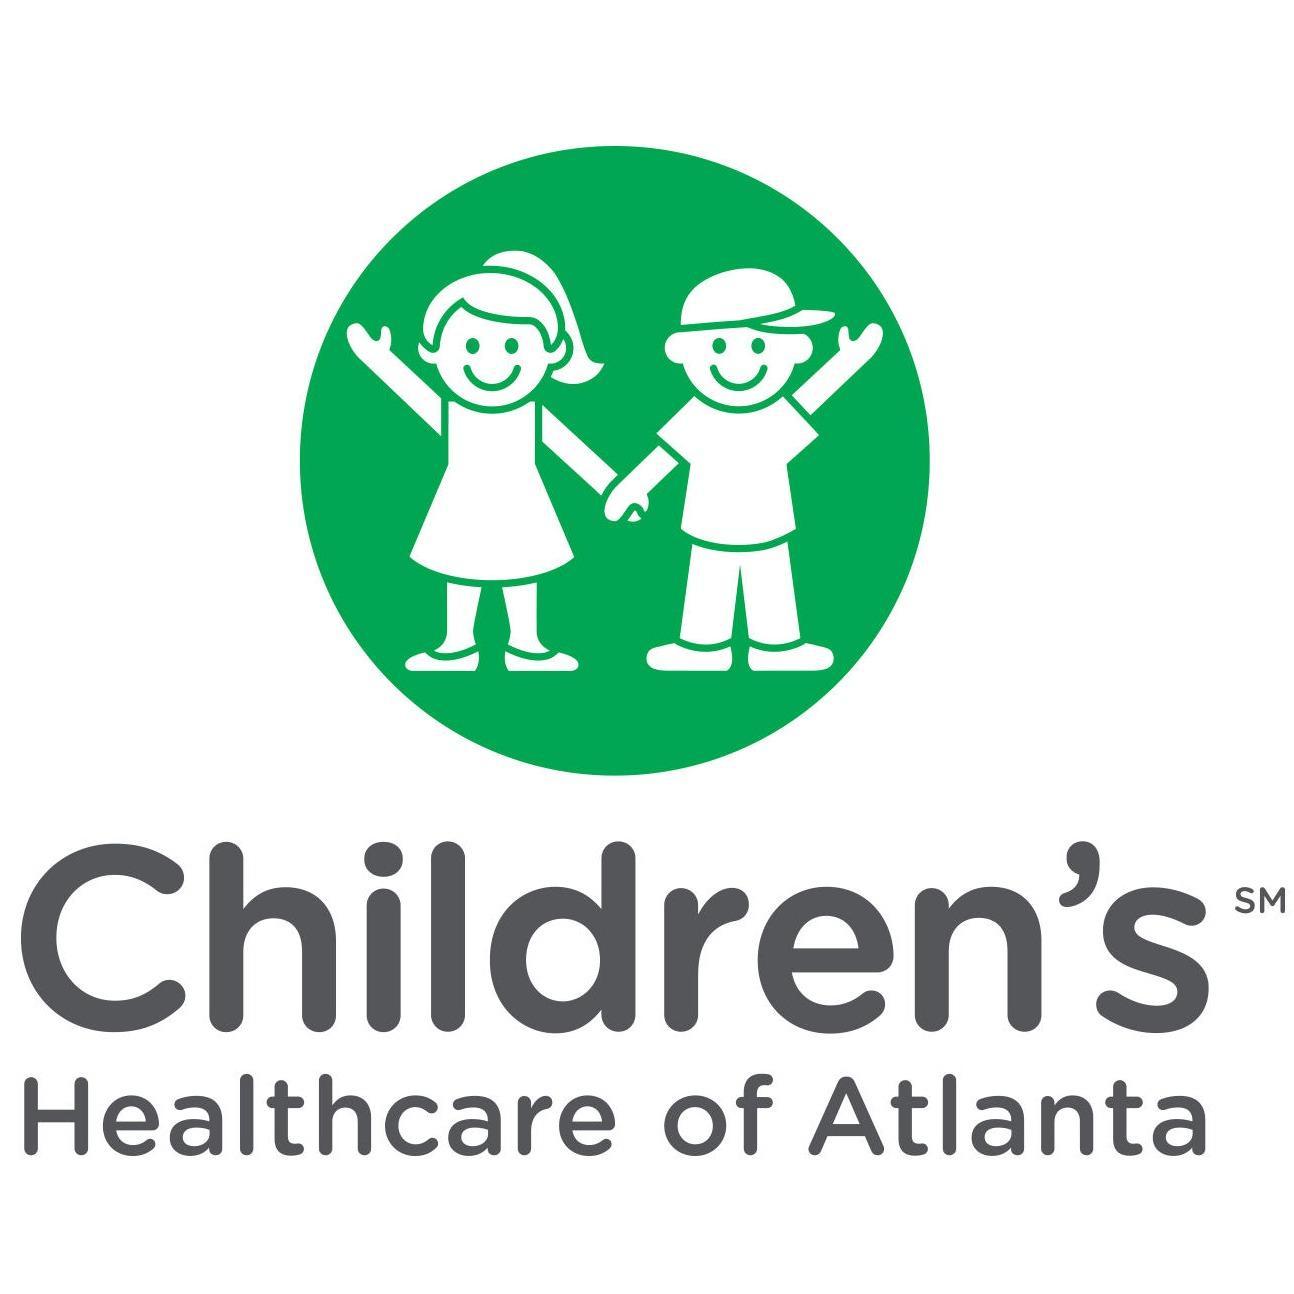 Children's Healthcare of Atlanta Orthotics and Prosthetics - Old Milton Parkway image 1